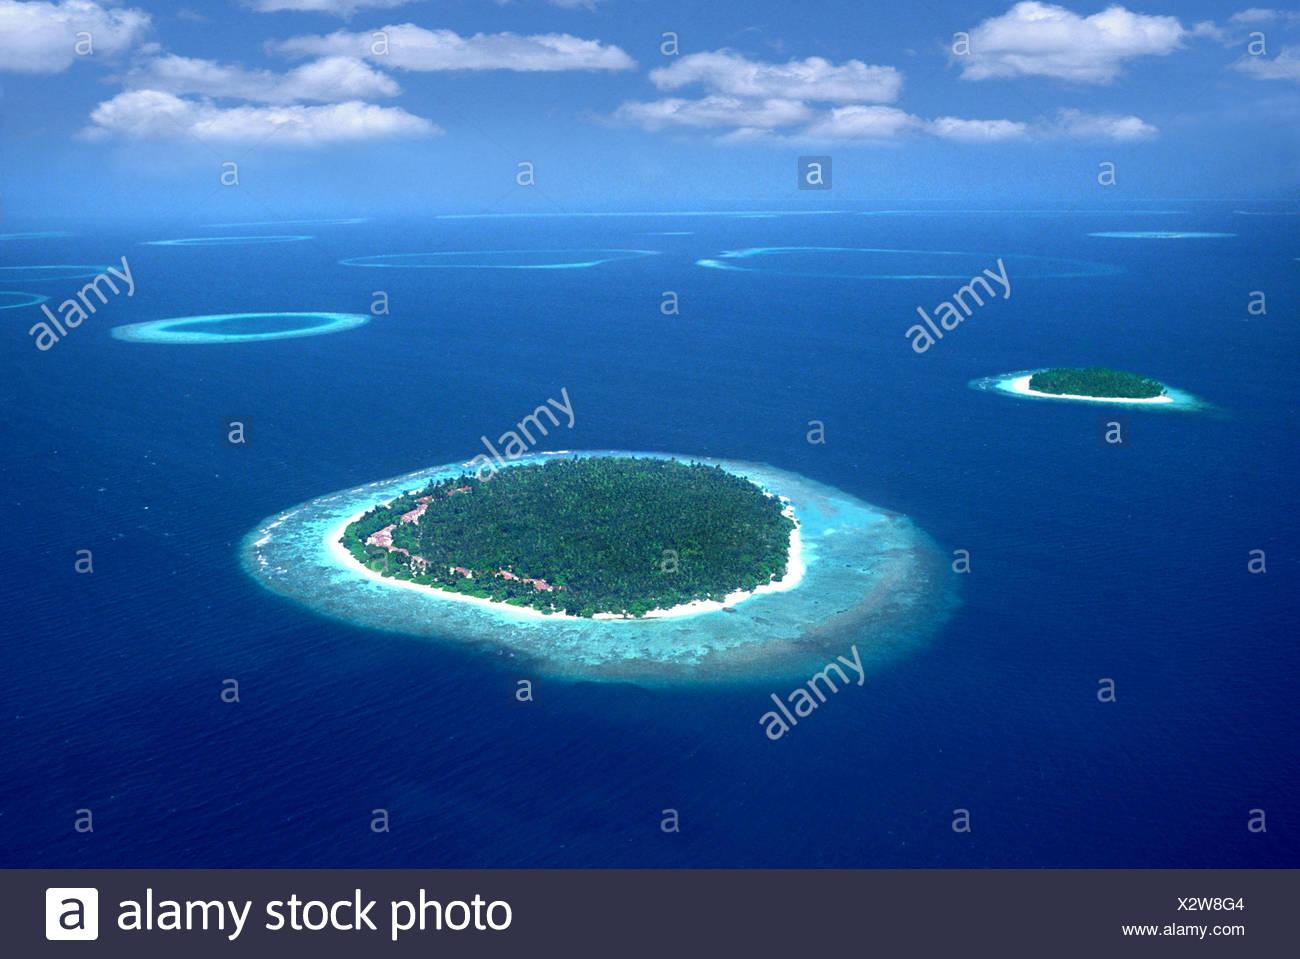 Maledives, group of islands, Maldives - Stock Image